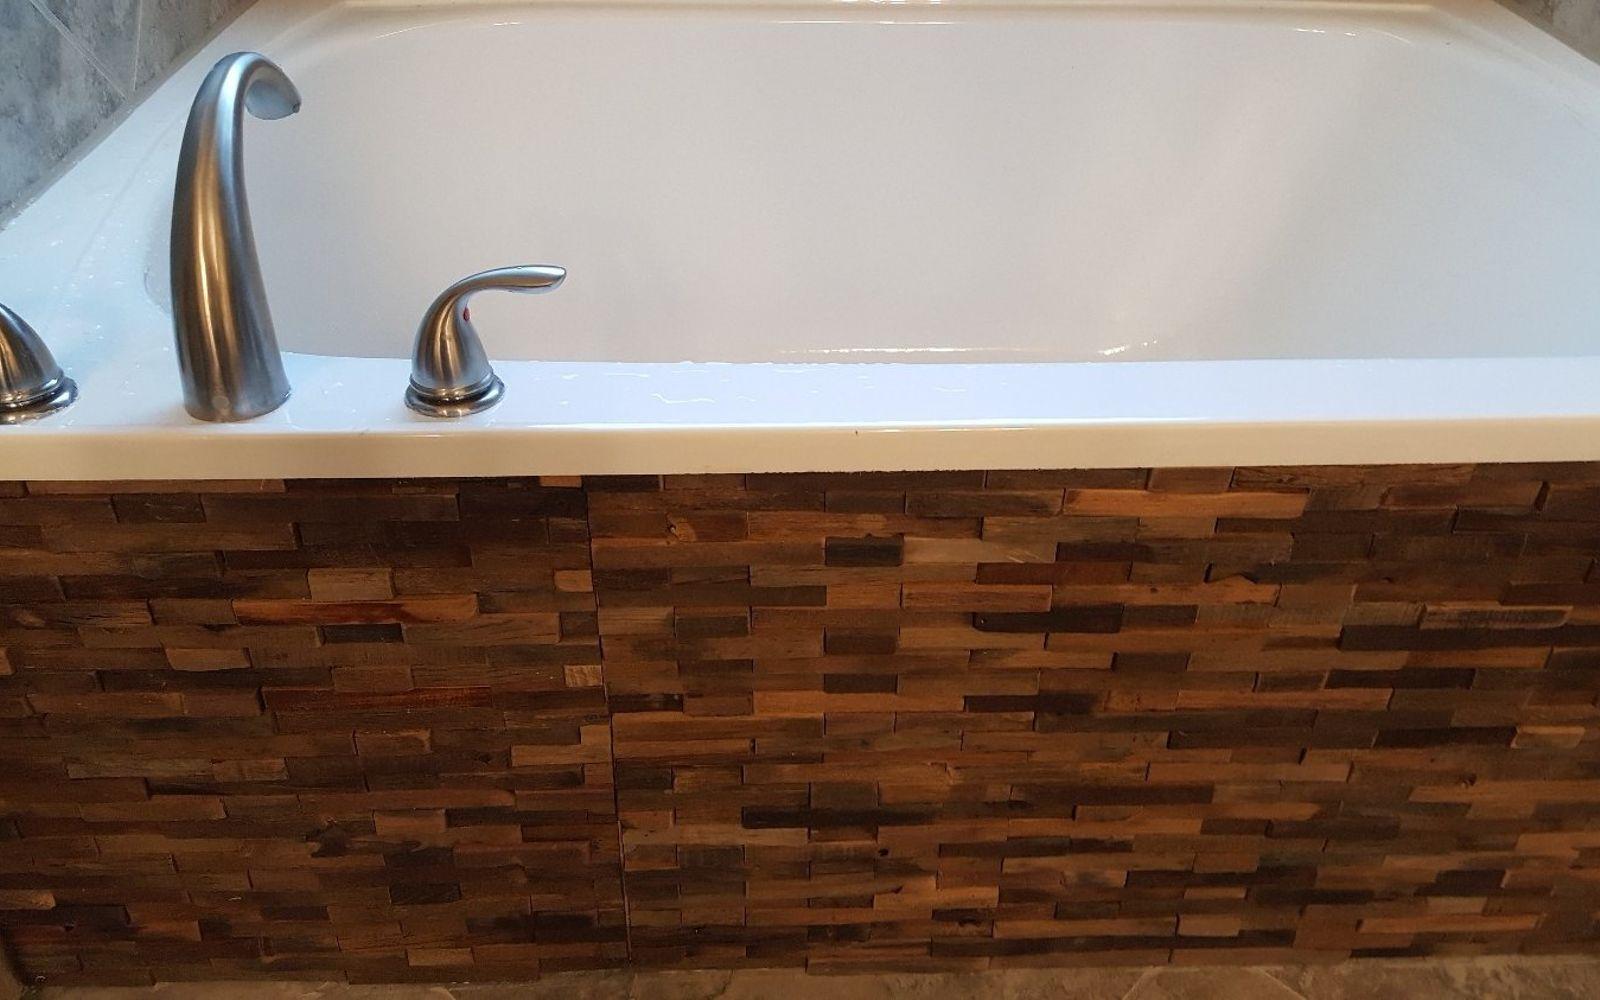 s 11 easy ways to refresh your old bathtub, Revamp The Bathtub